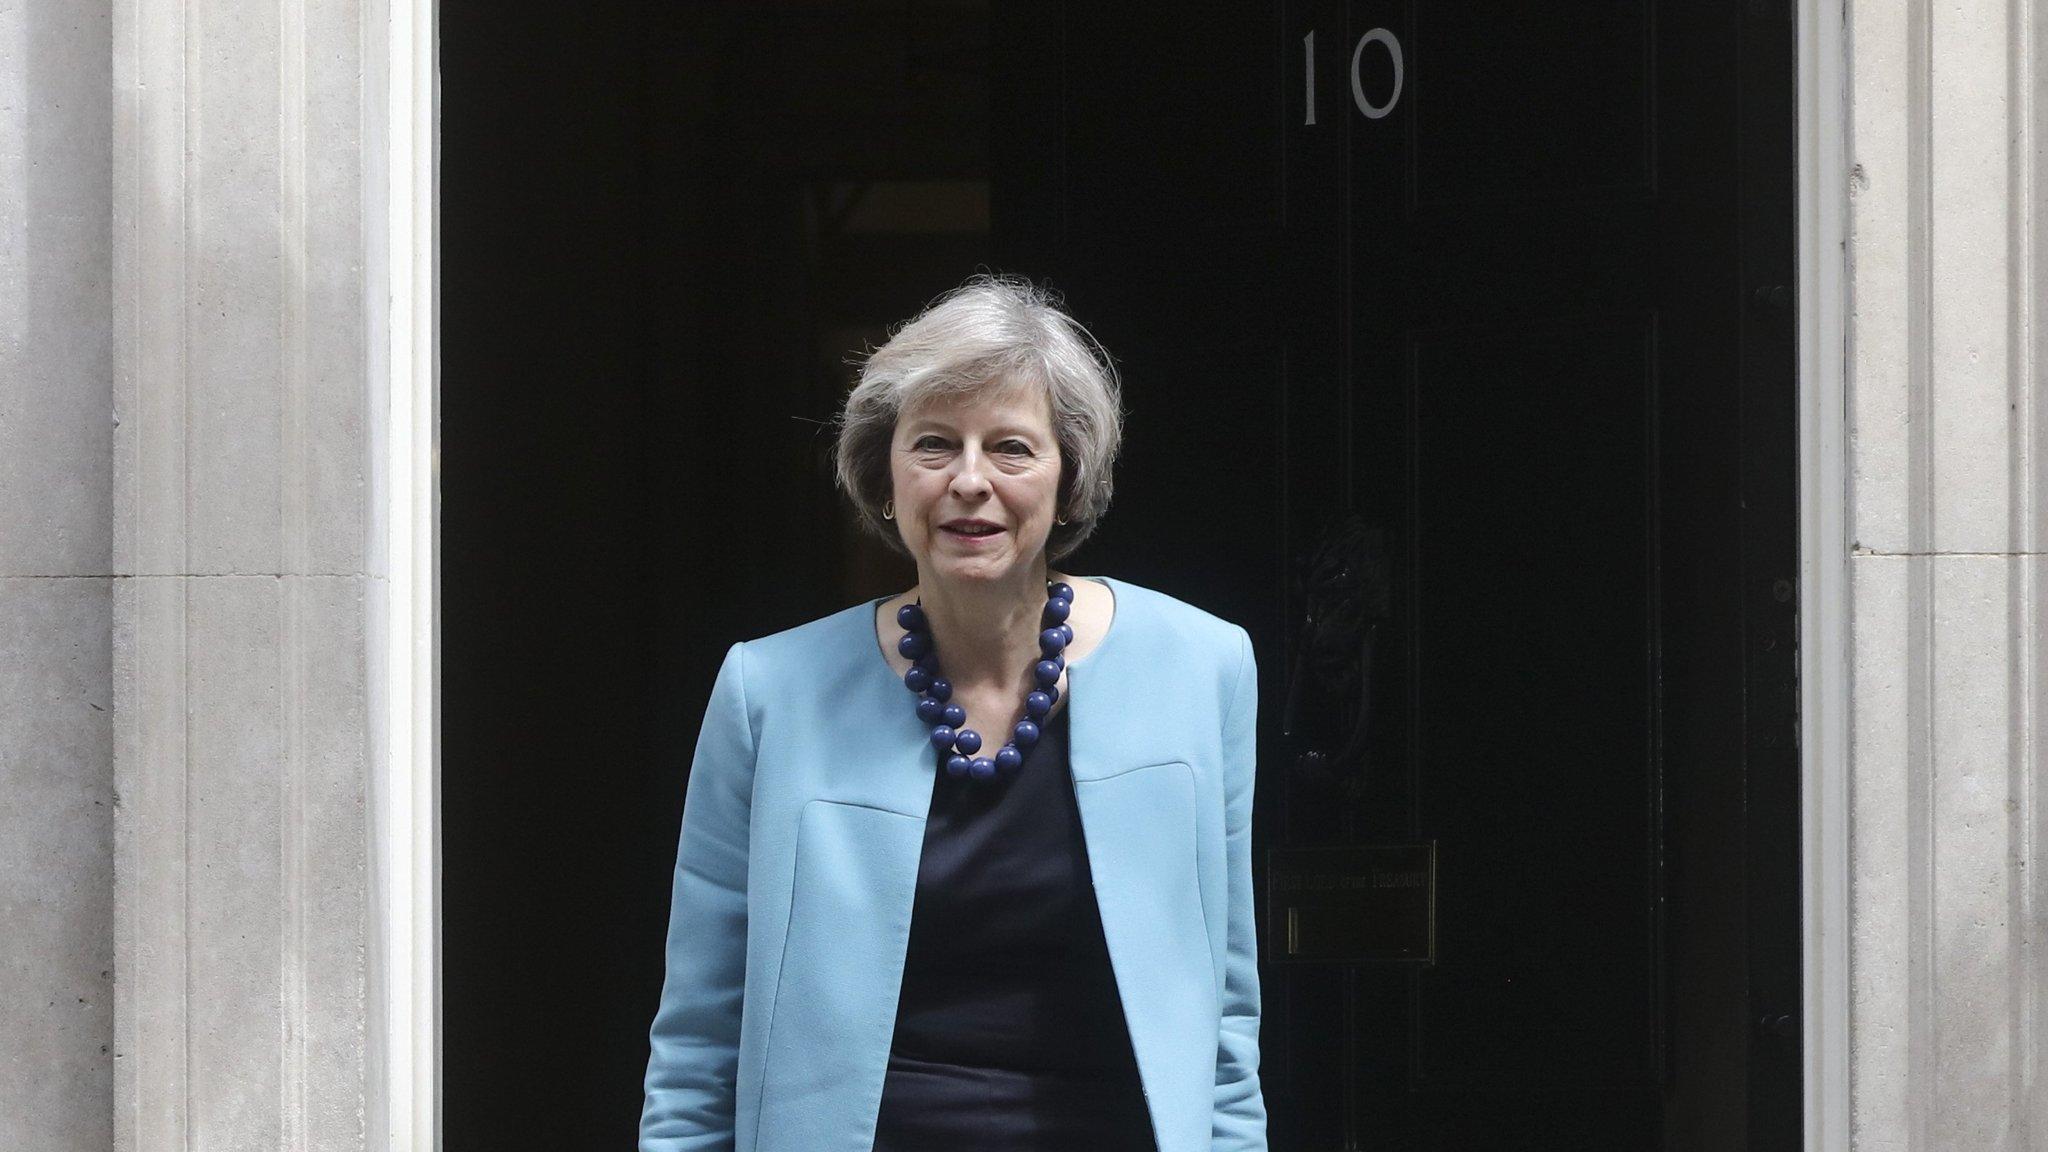 Theresa May: Britain's Angela Merkel?